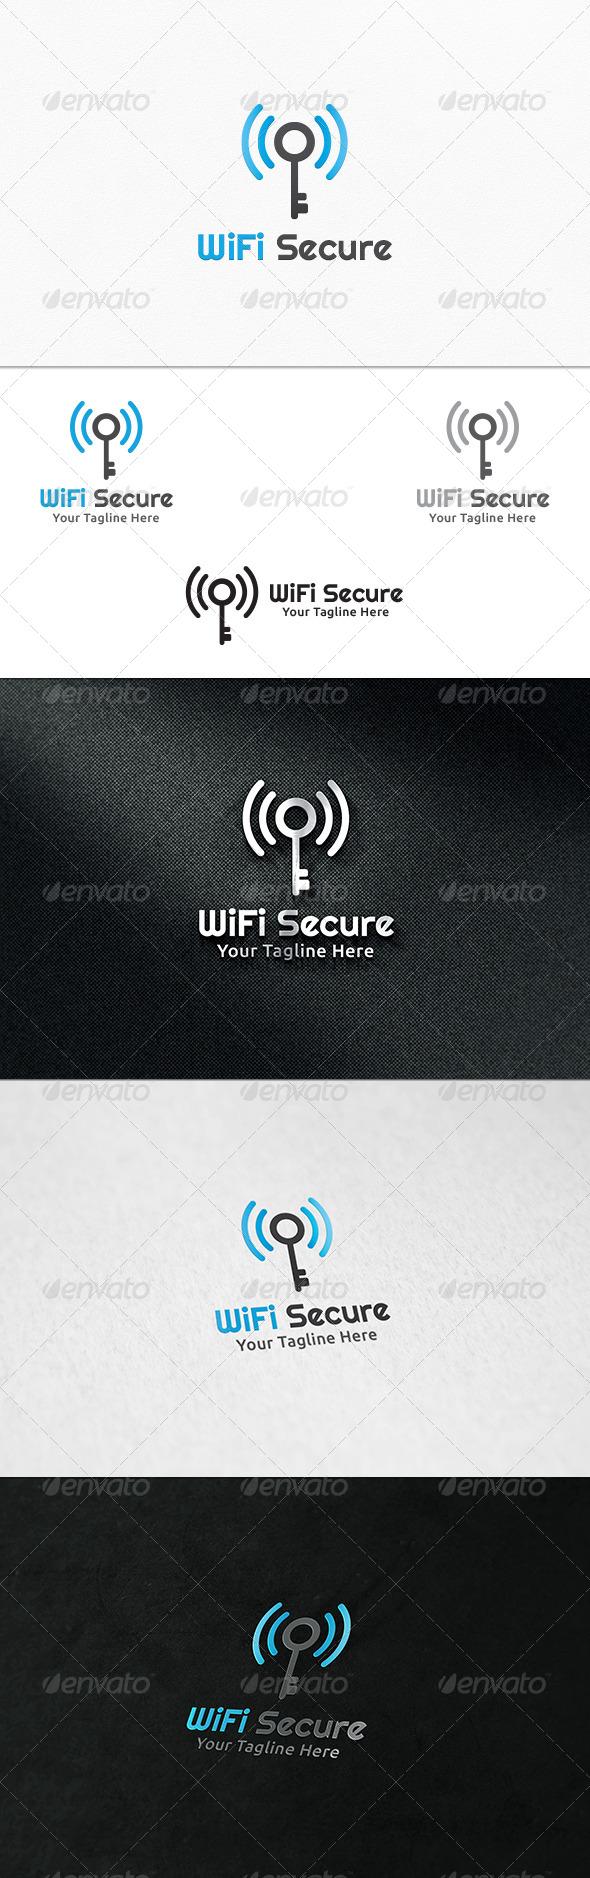 GraphicRiver Wifi Secure Logo Template 8027492